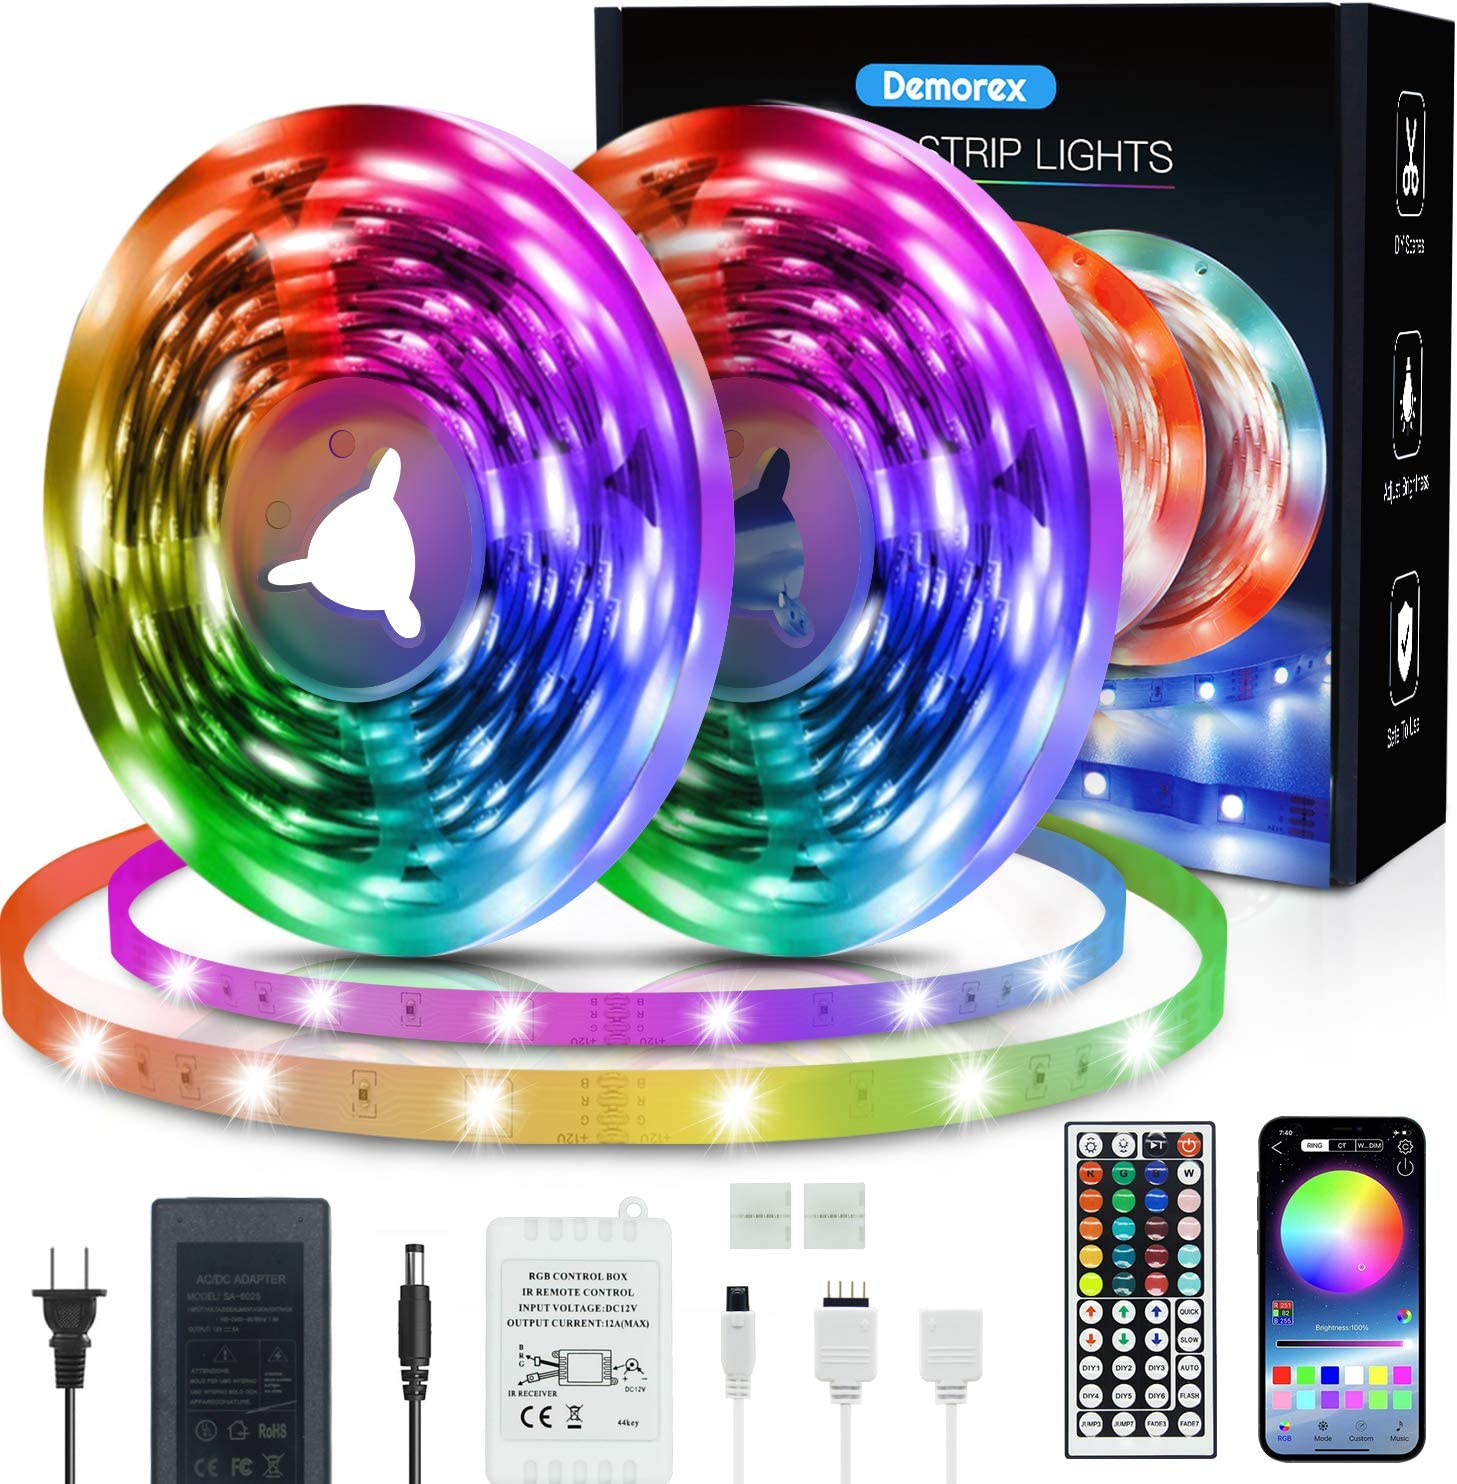 50ft Led excellence Strip Lights Sync Music Color Demorex safety